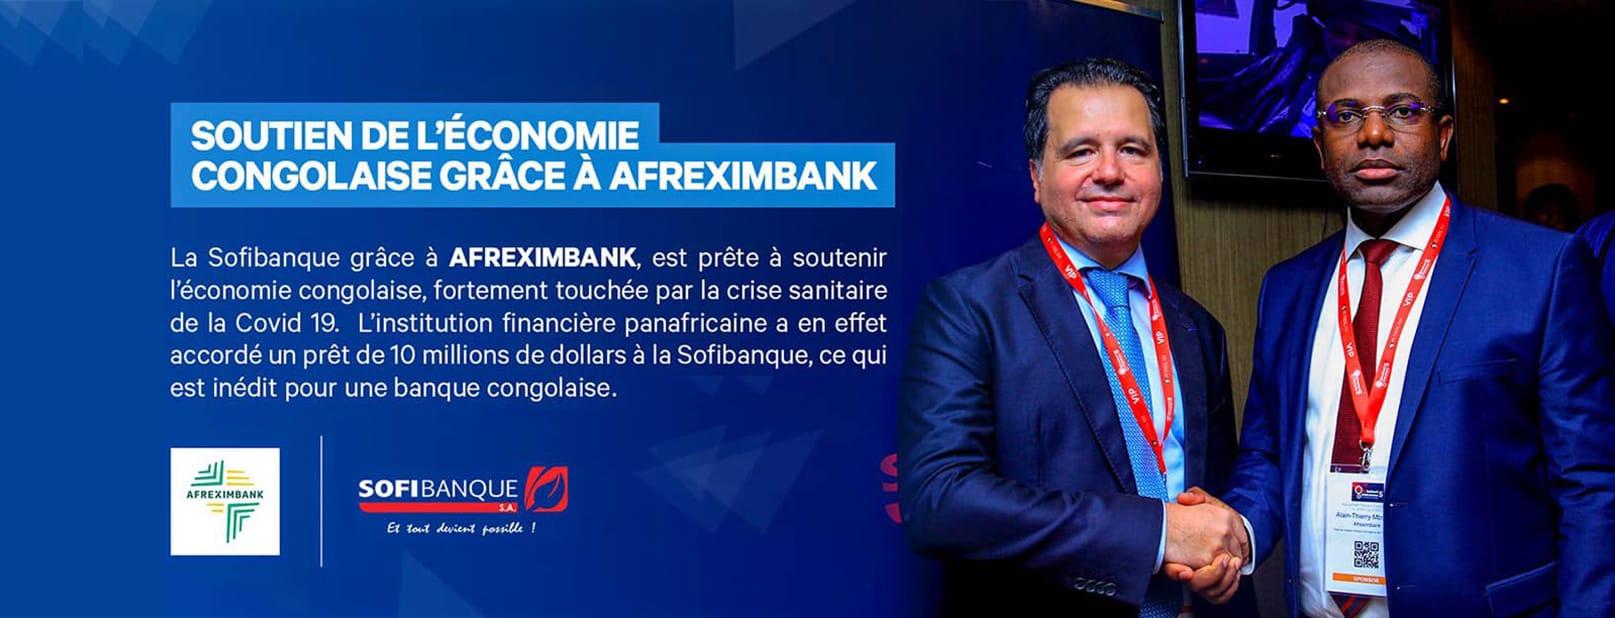 sofibanque-bizcongo-banner-24072020-v2